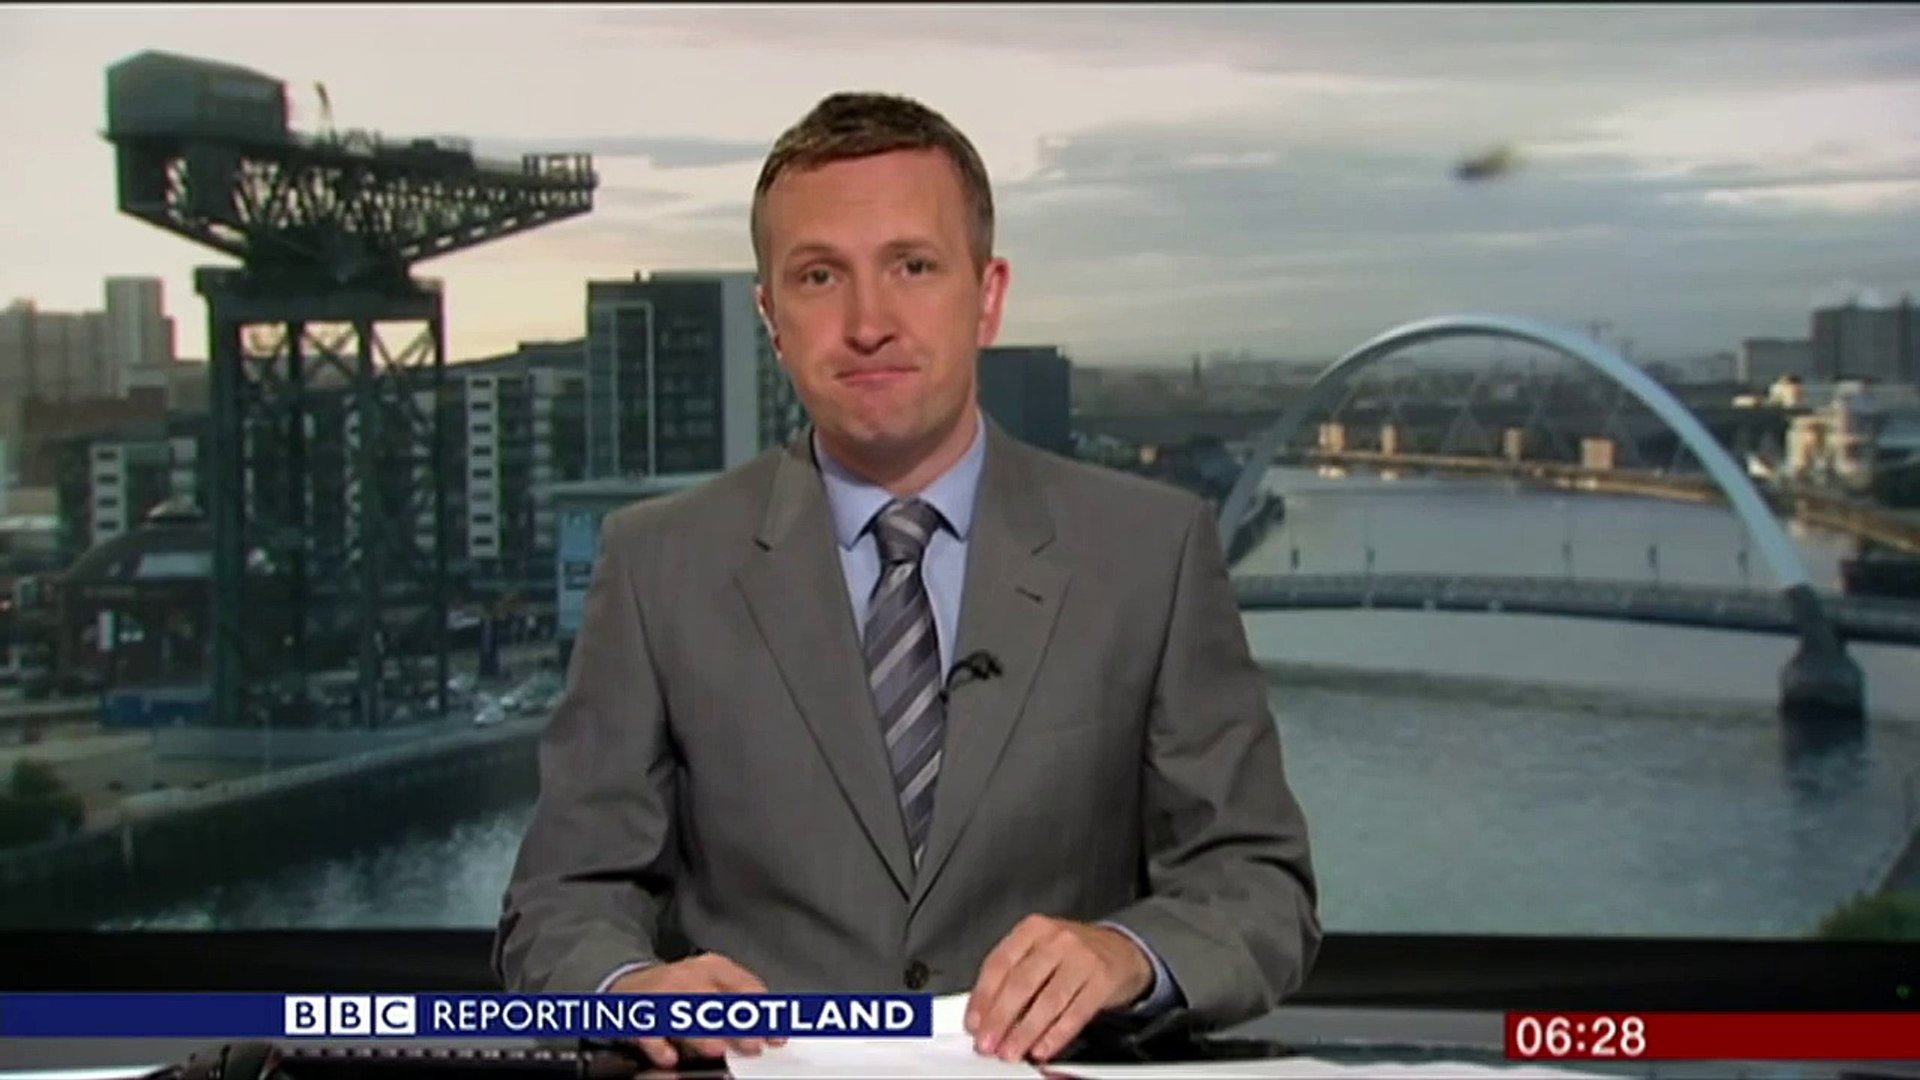 'Giant' spider photobombs BBC Scotland news - BBC News